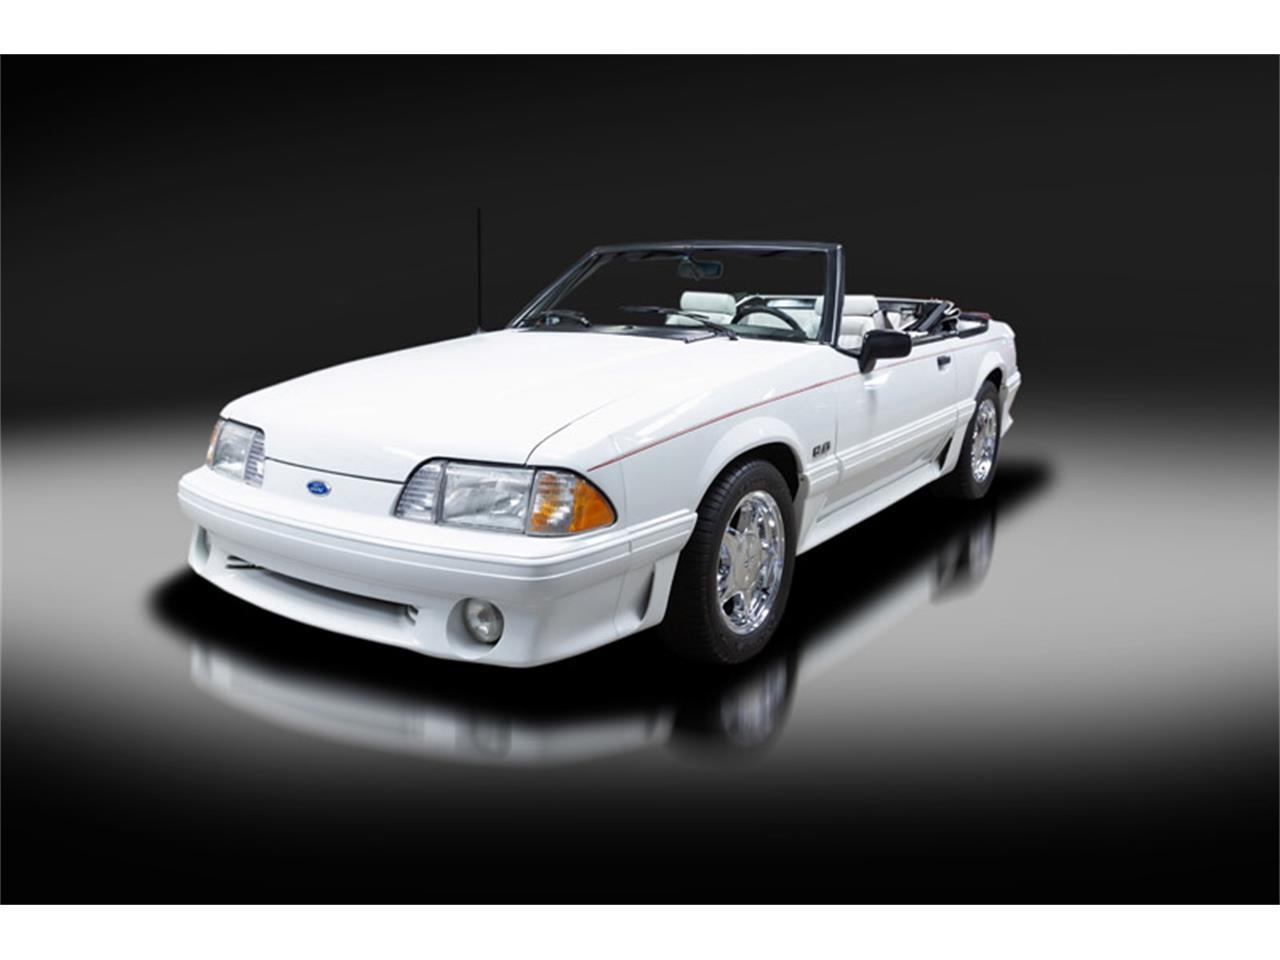 91 Mustang Gt >> For Sale 1991 Ford Mustang Gt In Seekonk Massachusetts